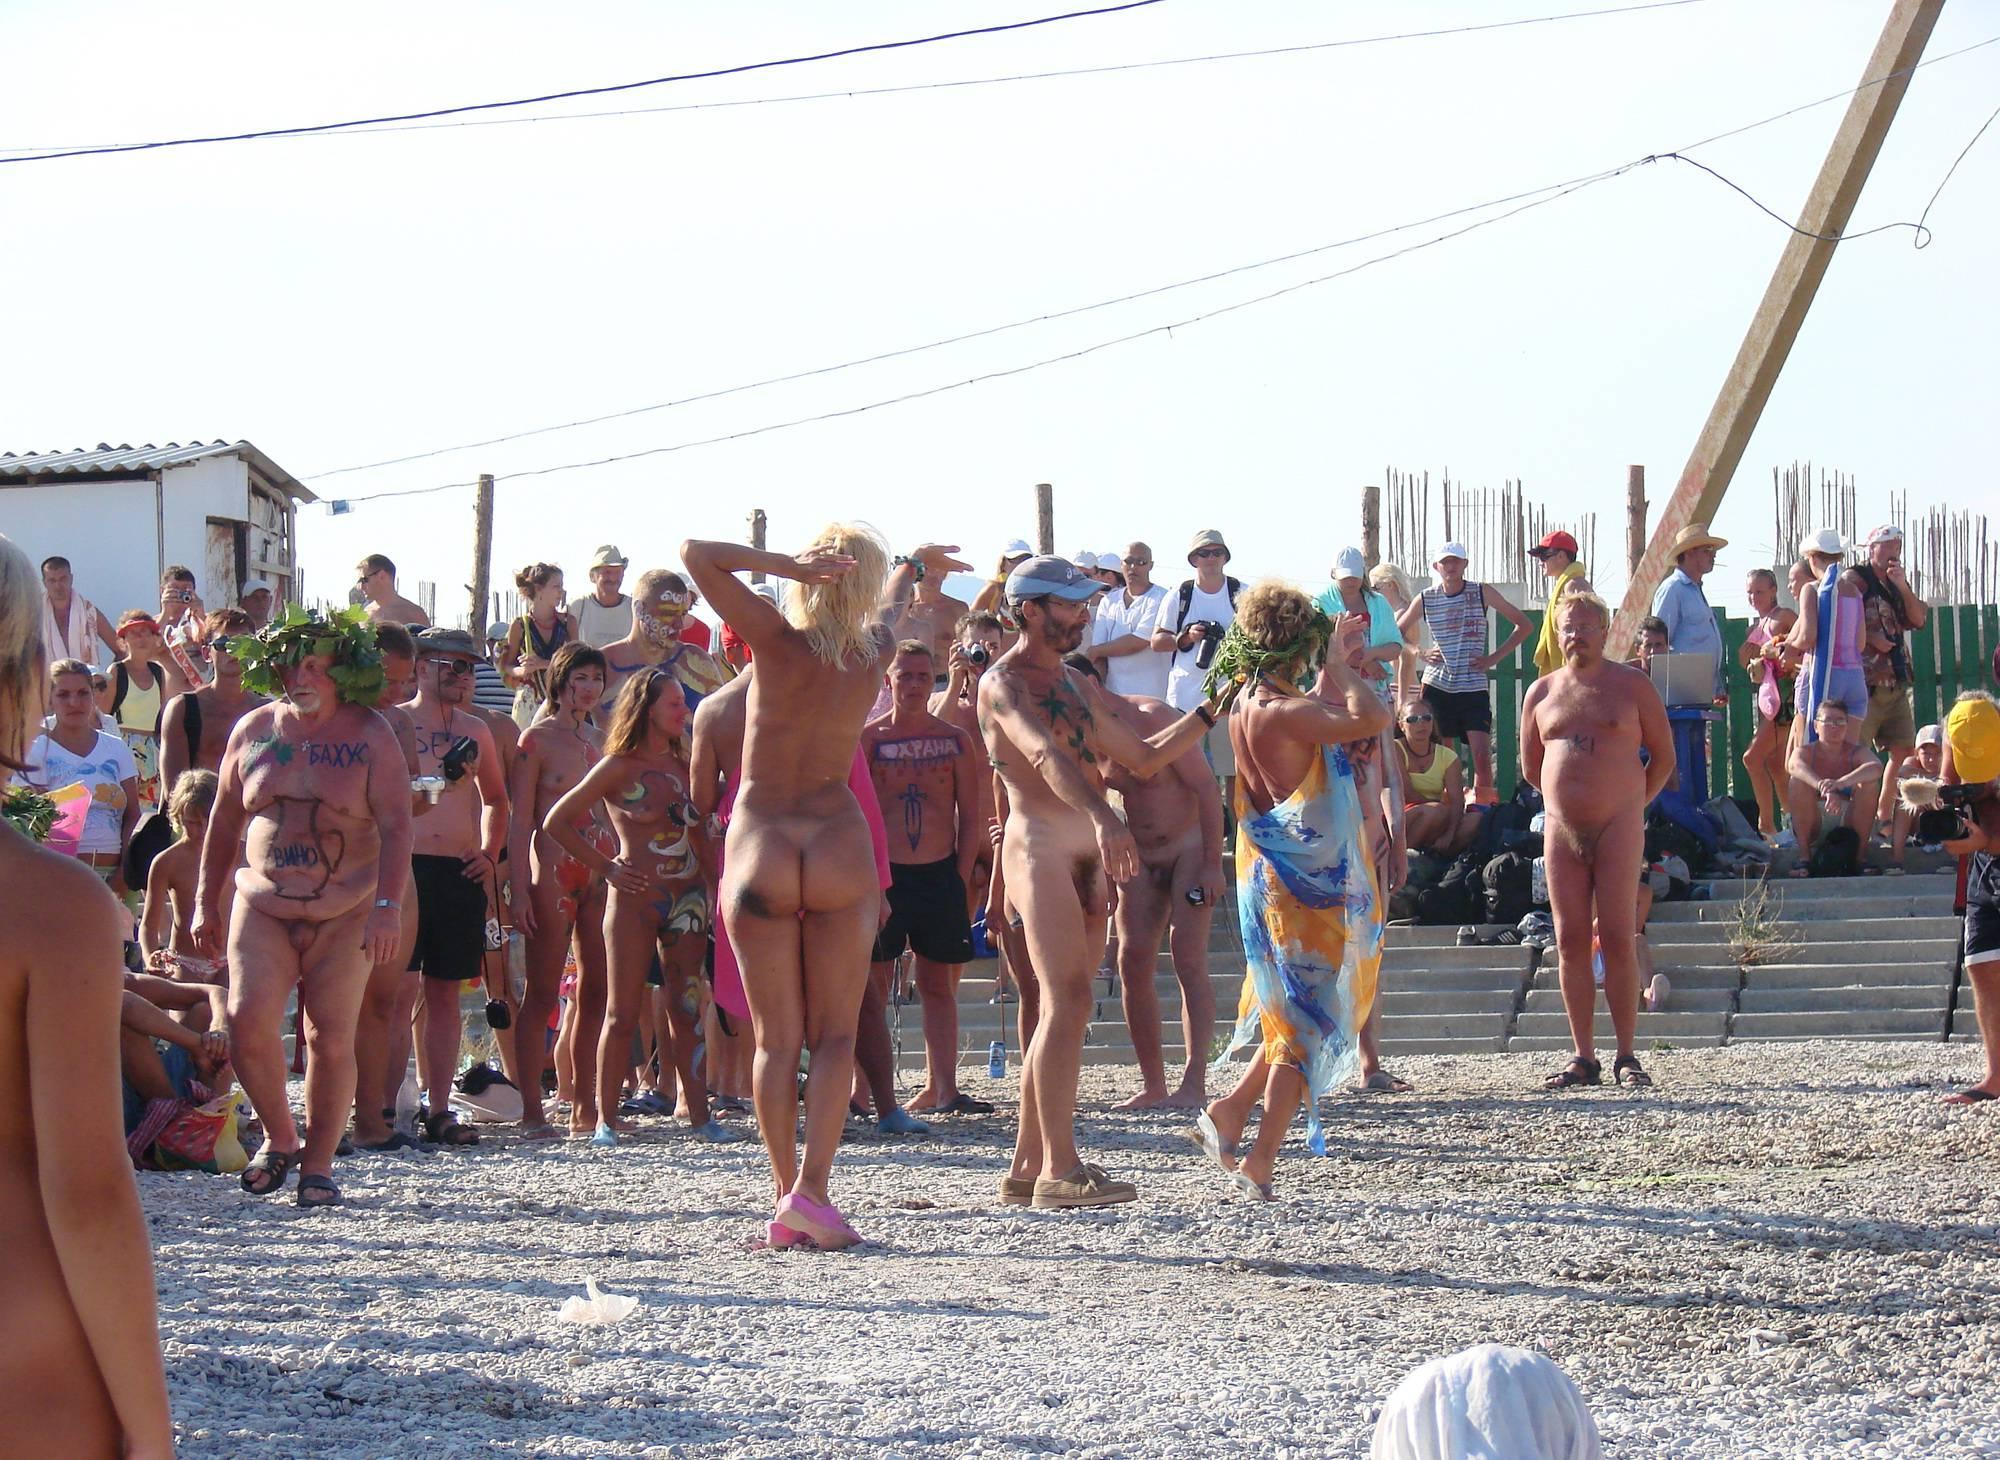 Nudist Gallery Neptune Day Dance Views - 2